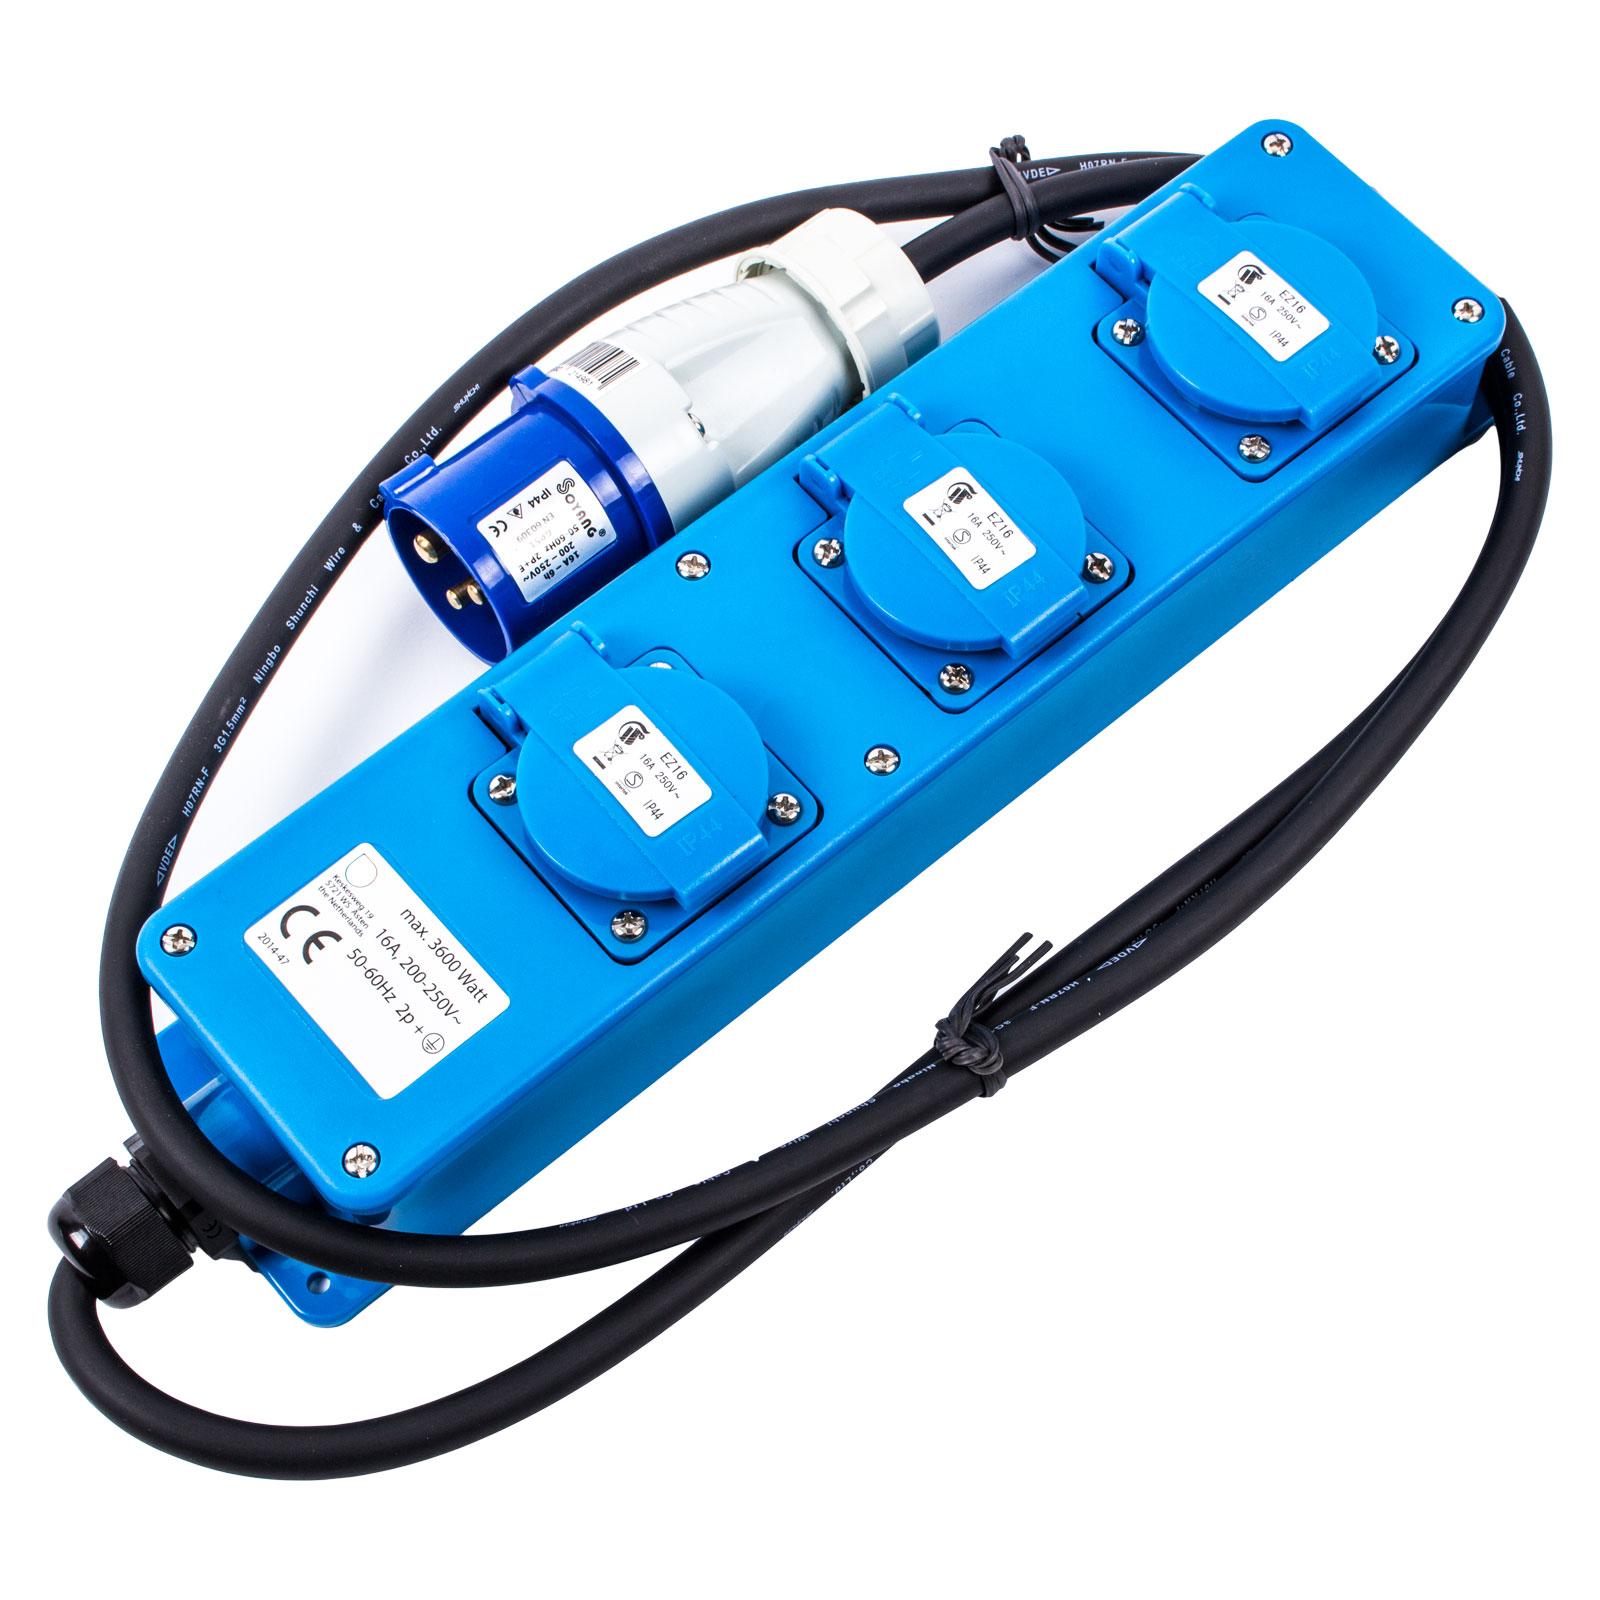 Soyang®  CEE Neopren Mehrfachstecker 16 A 3600 Watt 200-250V 1,5 Meter